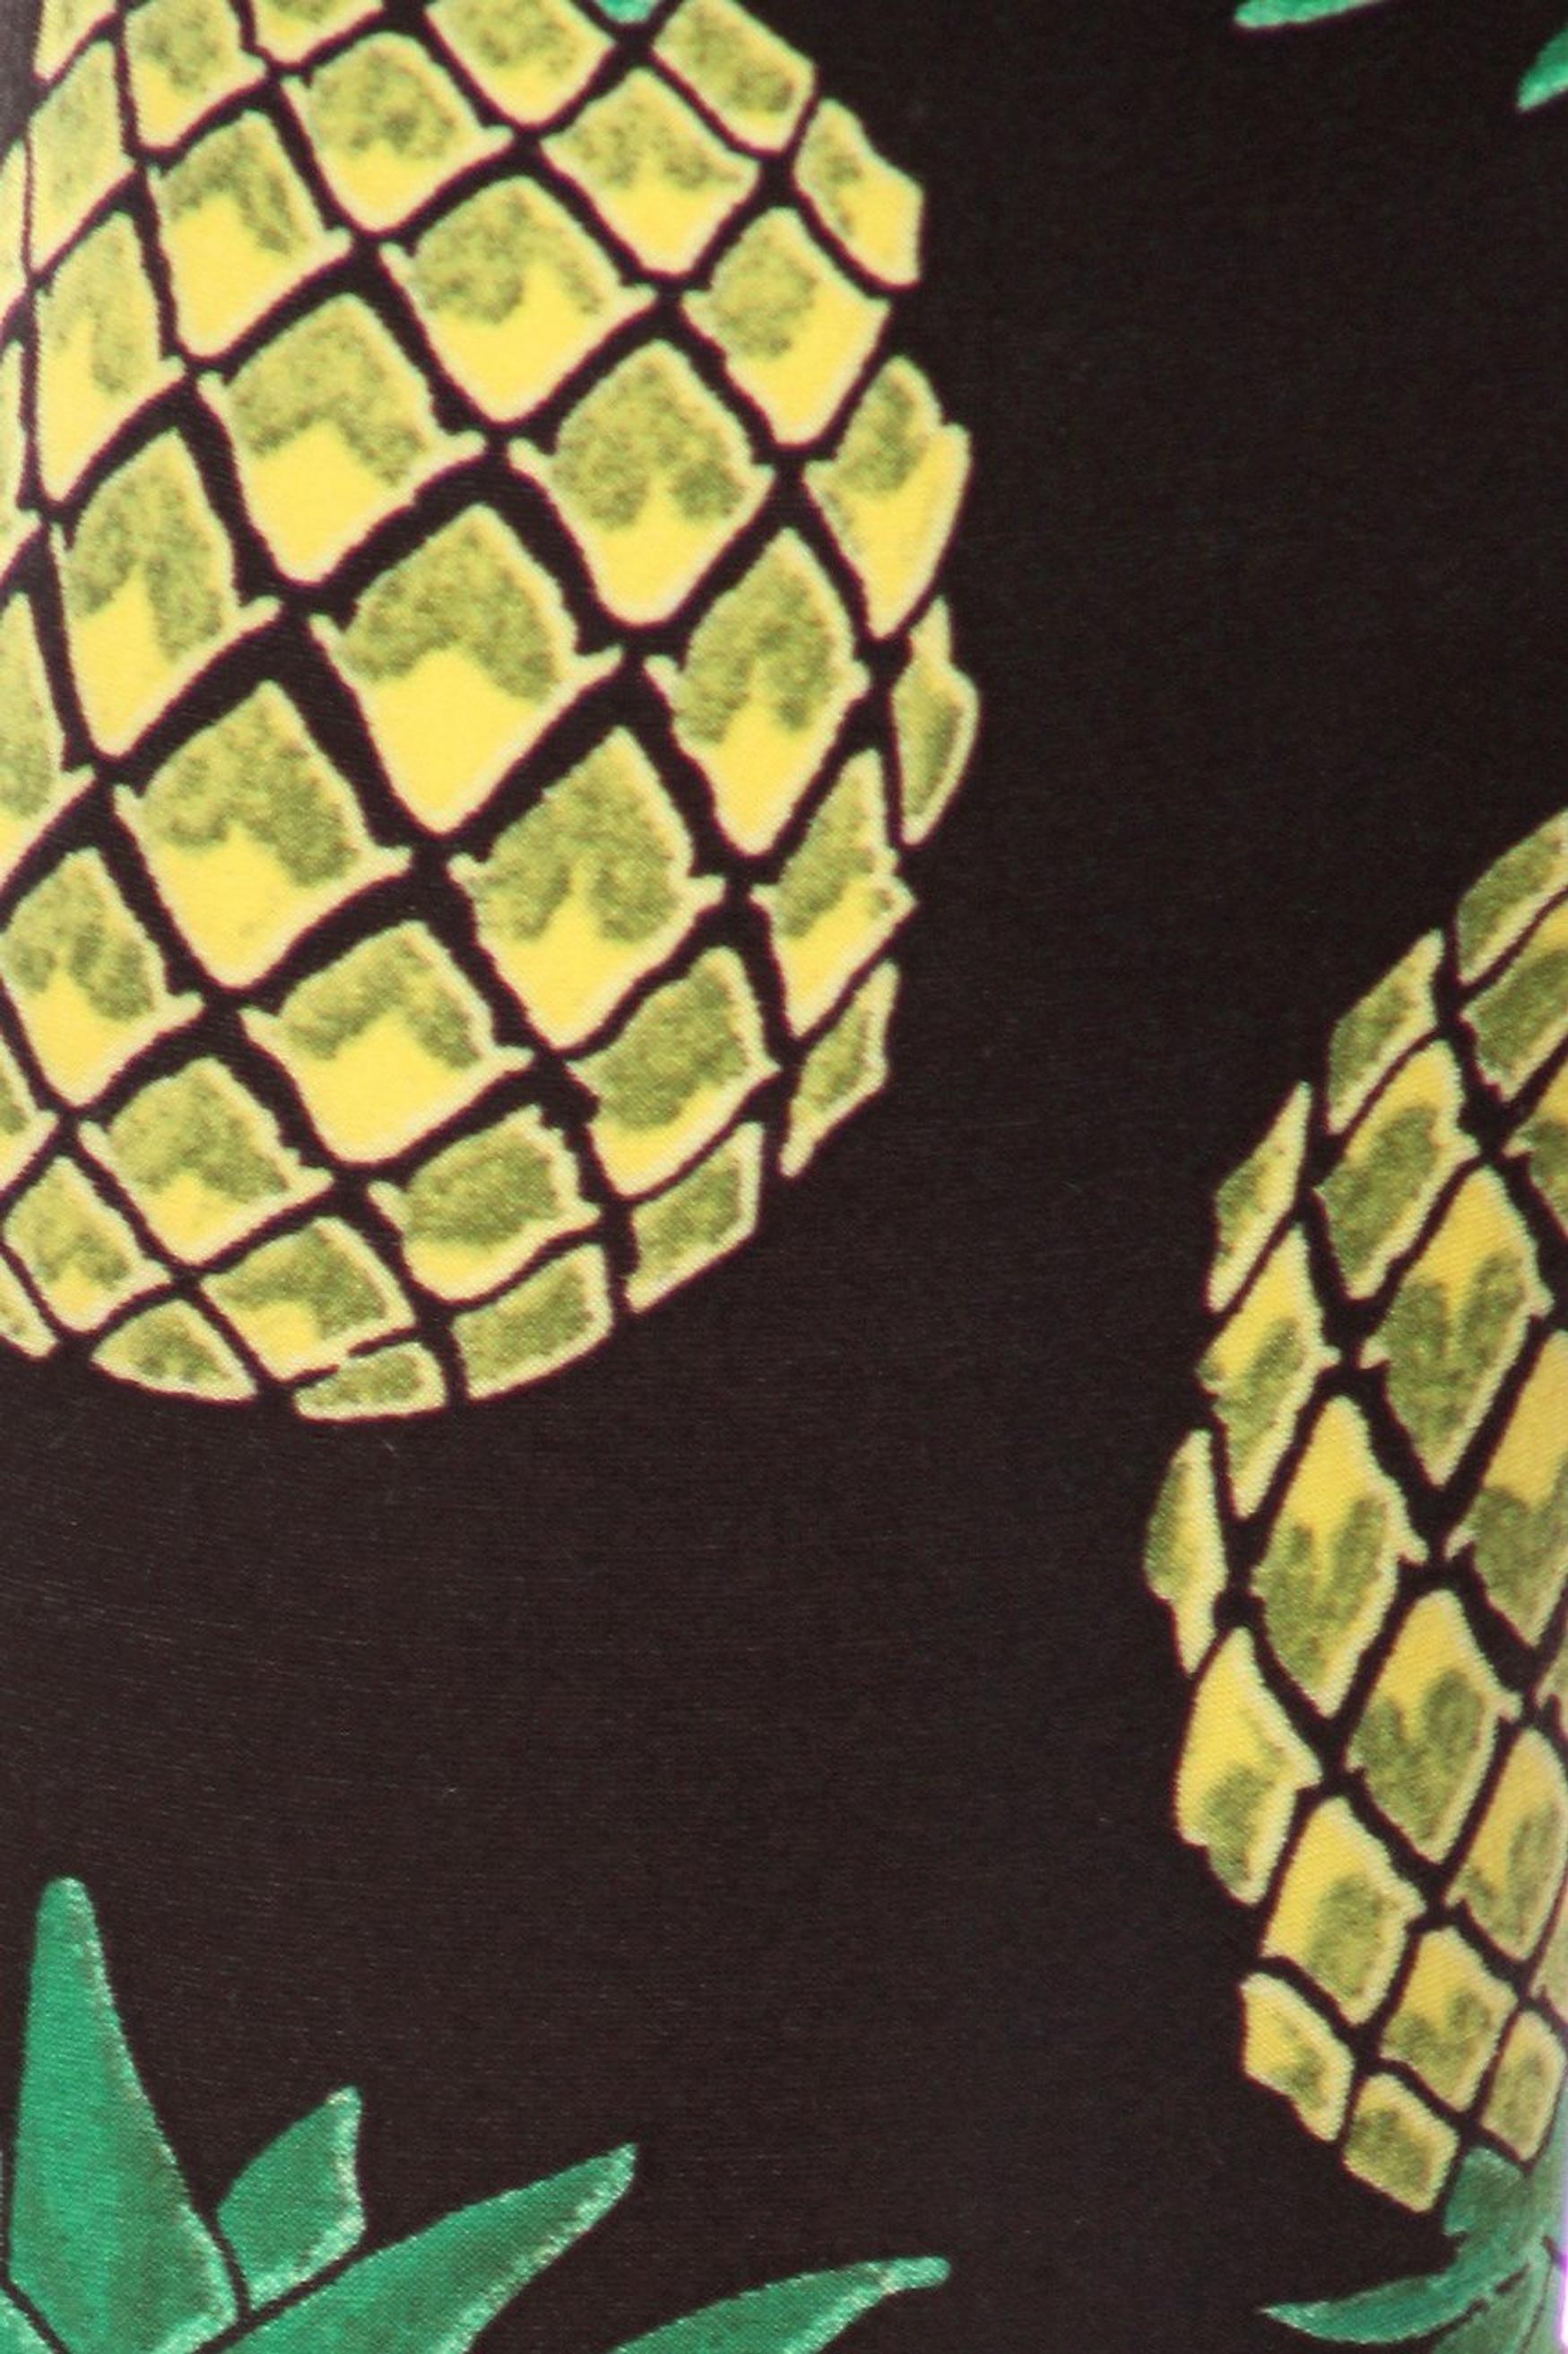 Brushed Green Pineapple Plus Size Leggings - 3X-5X